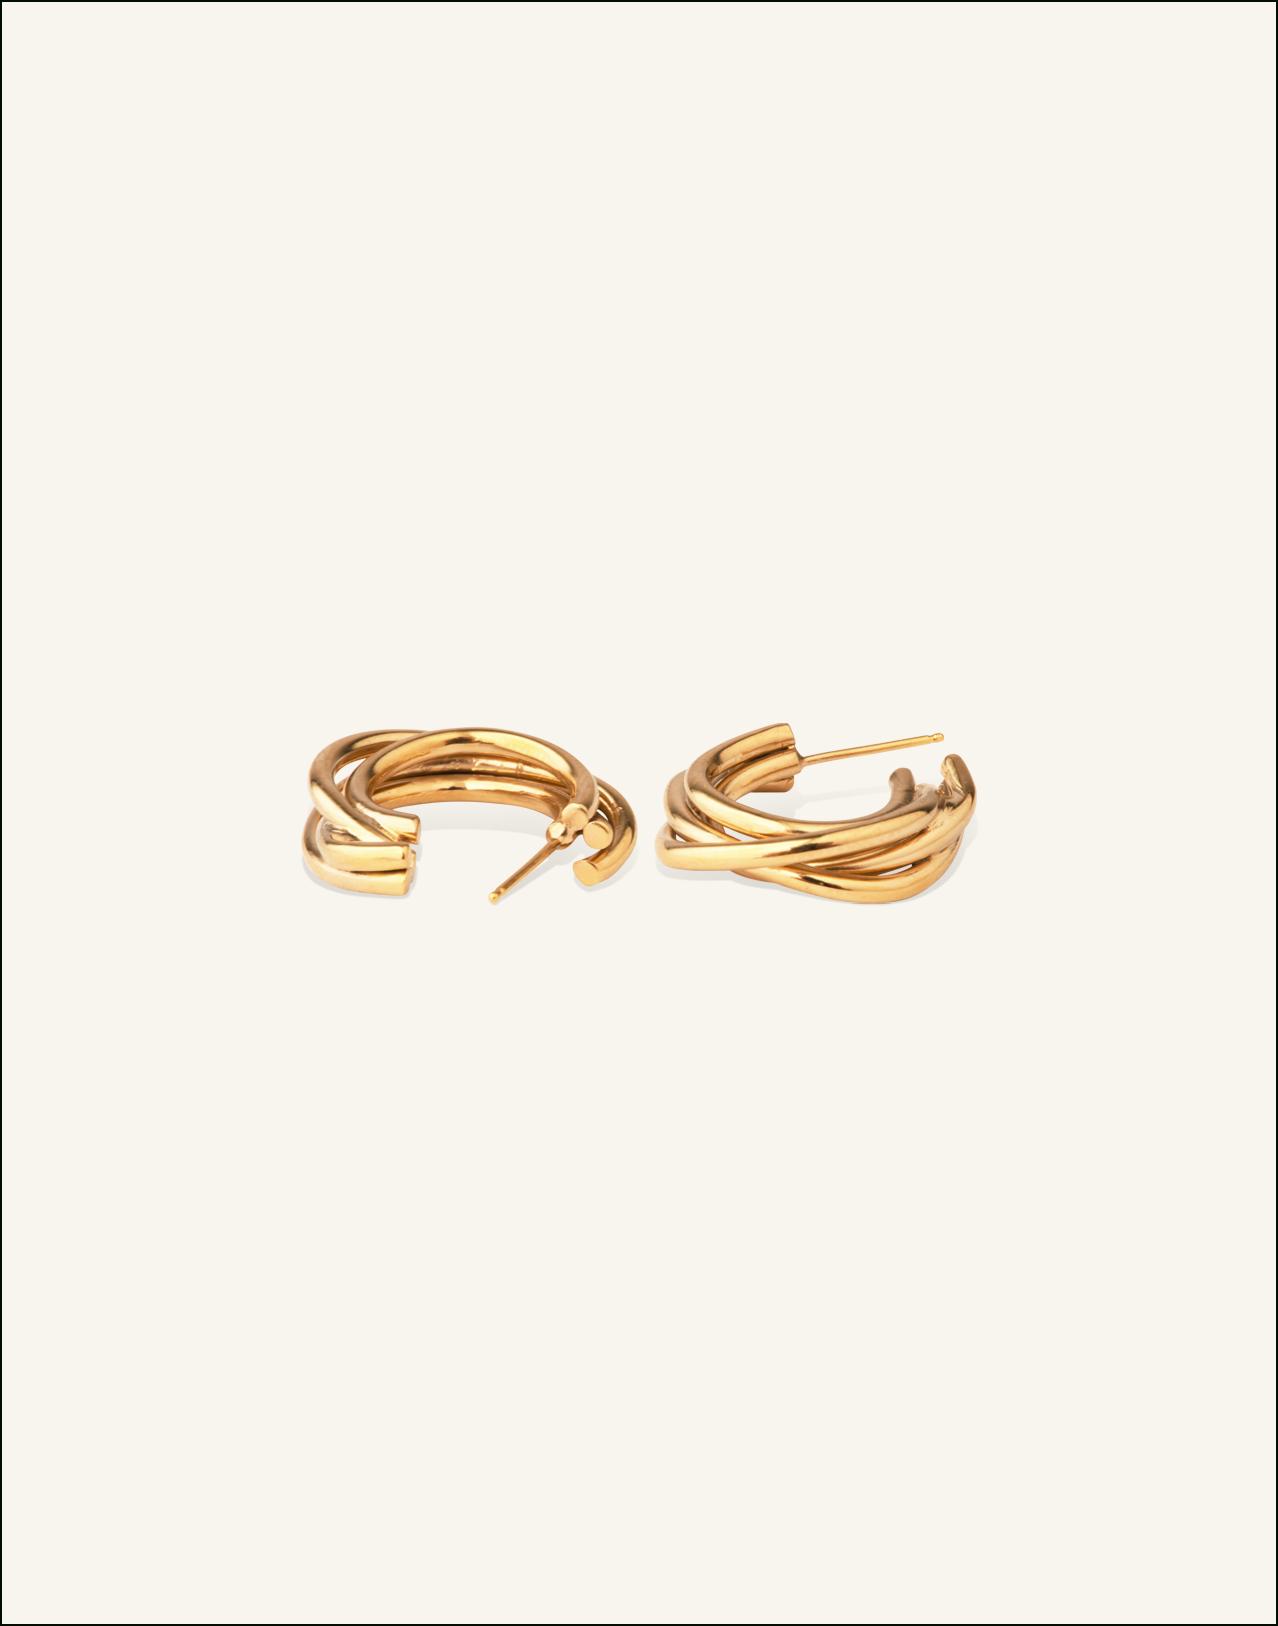 Completedworks-Earrings-An-Encounter-3-1.jpg